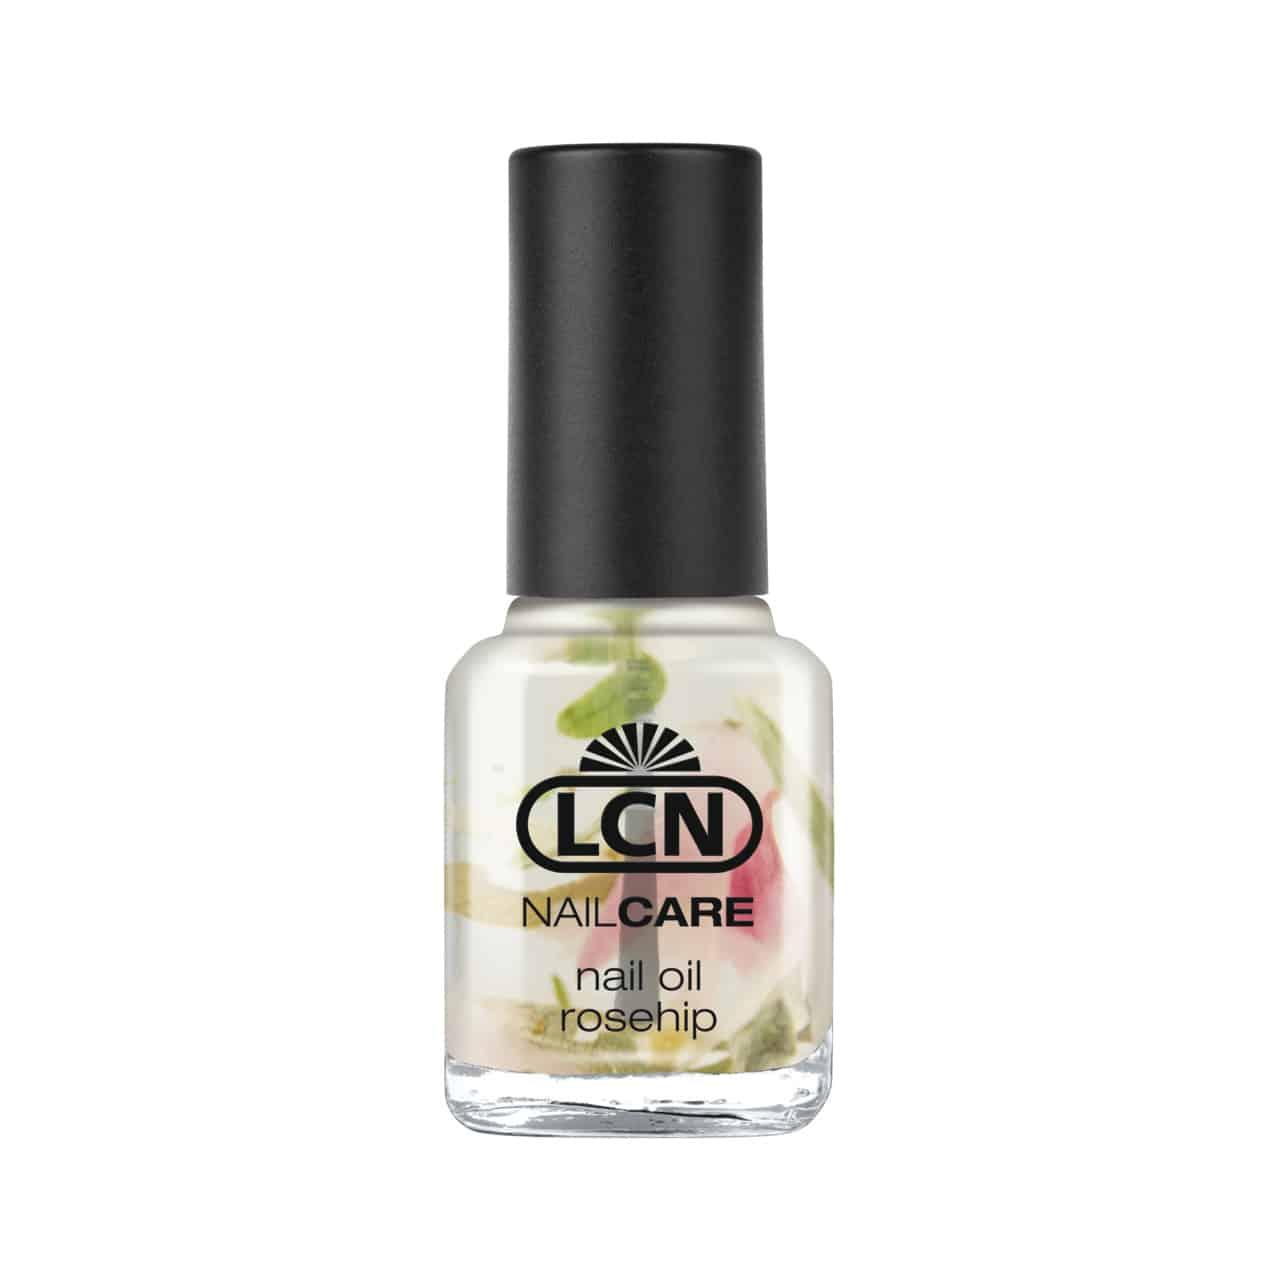 Rosehip nail oil